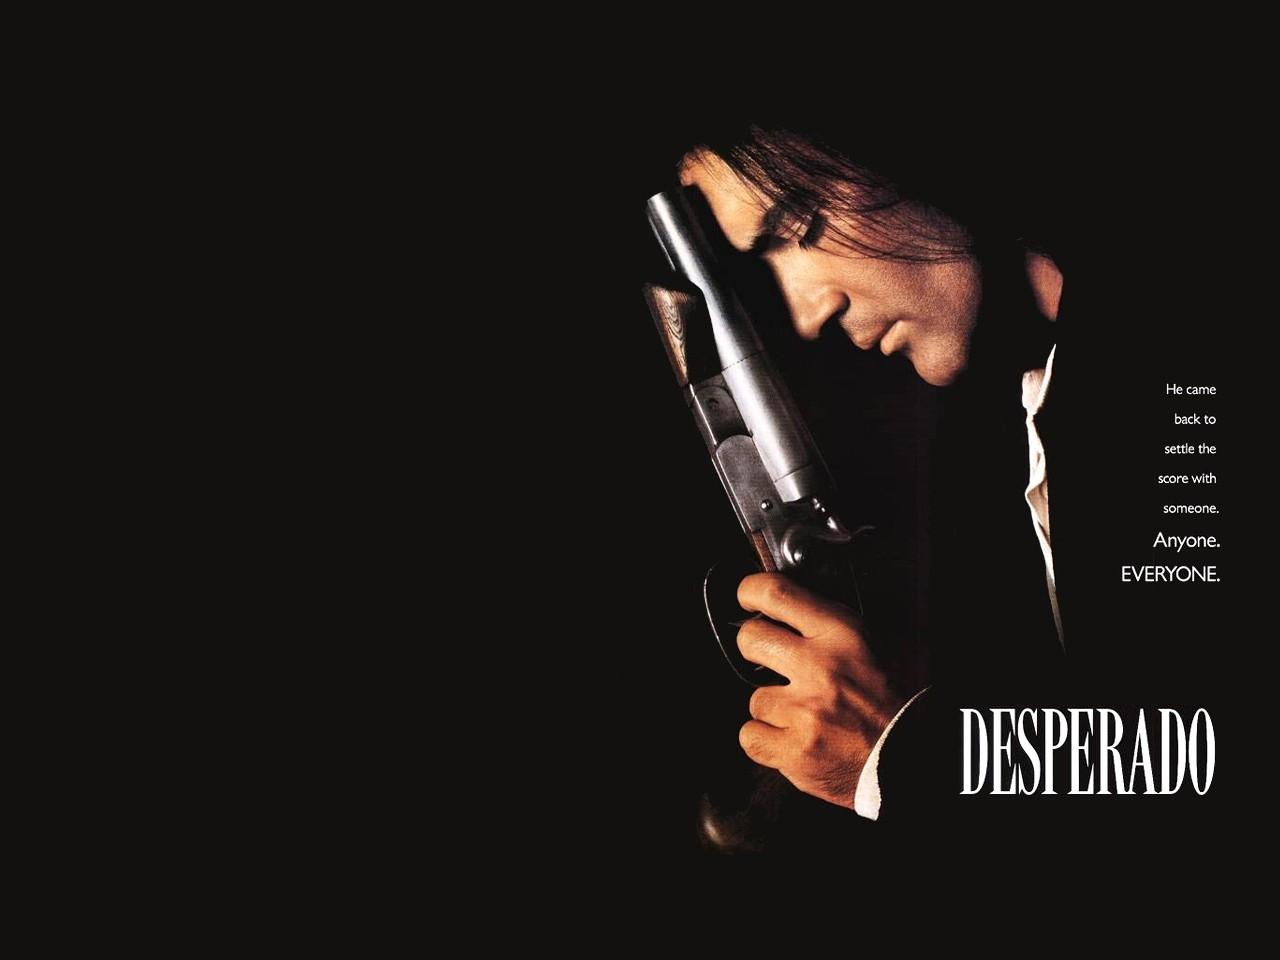 Wallpaper del film Desperado